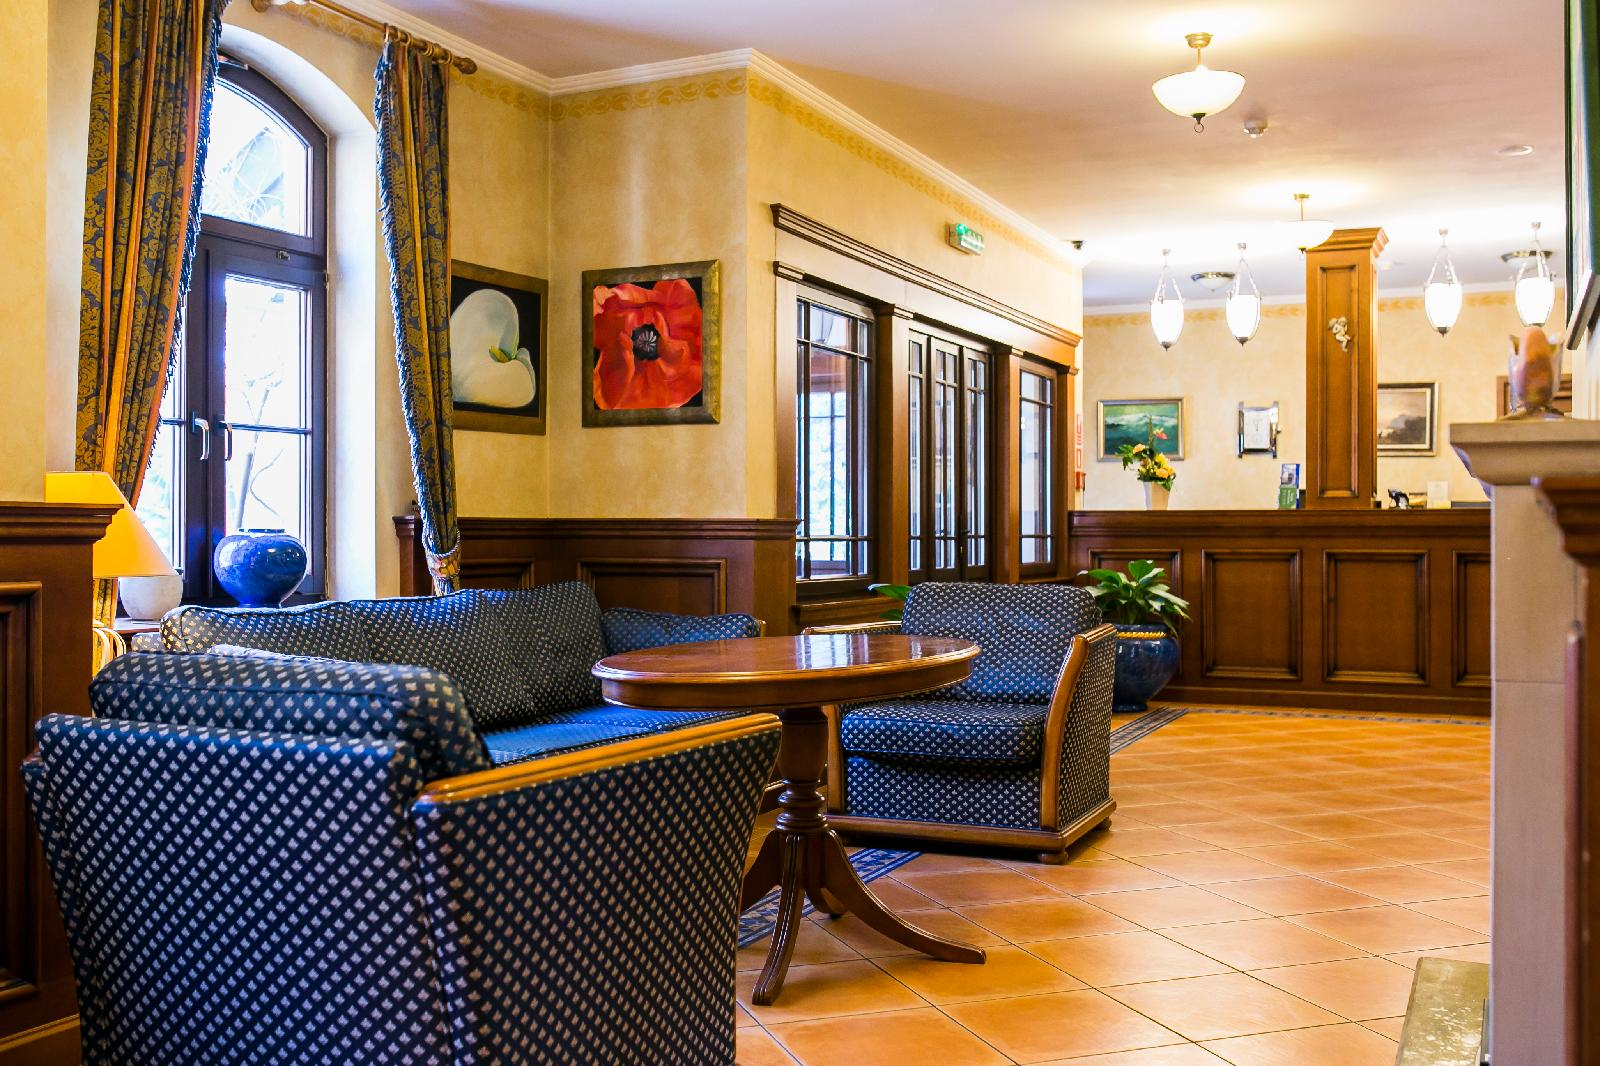 Gallery image of Hotel Opera